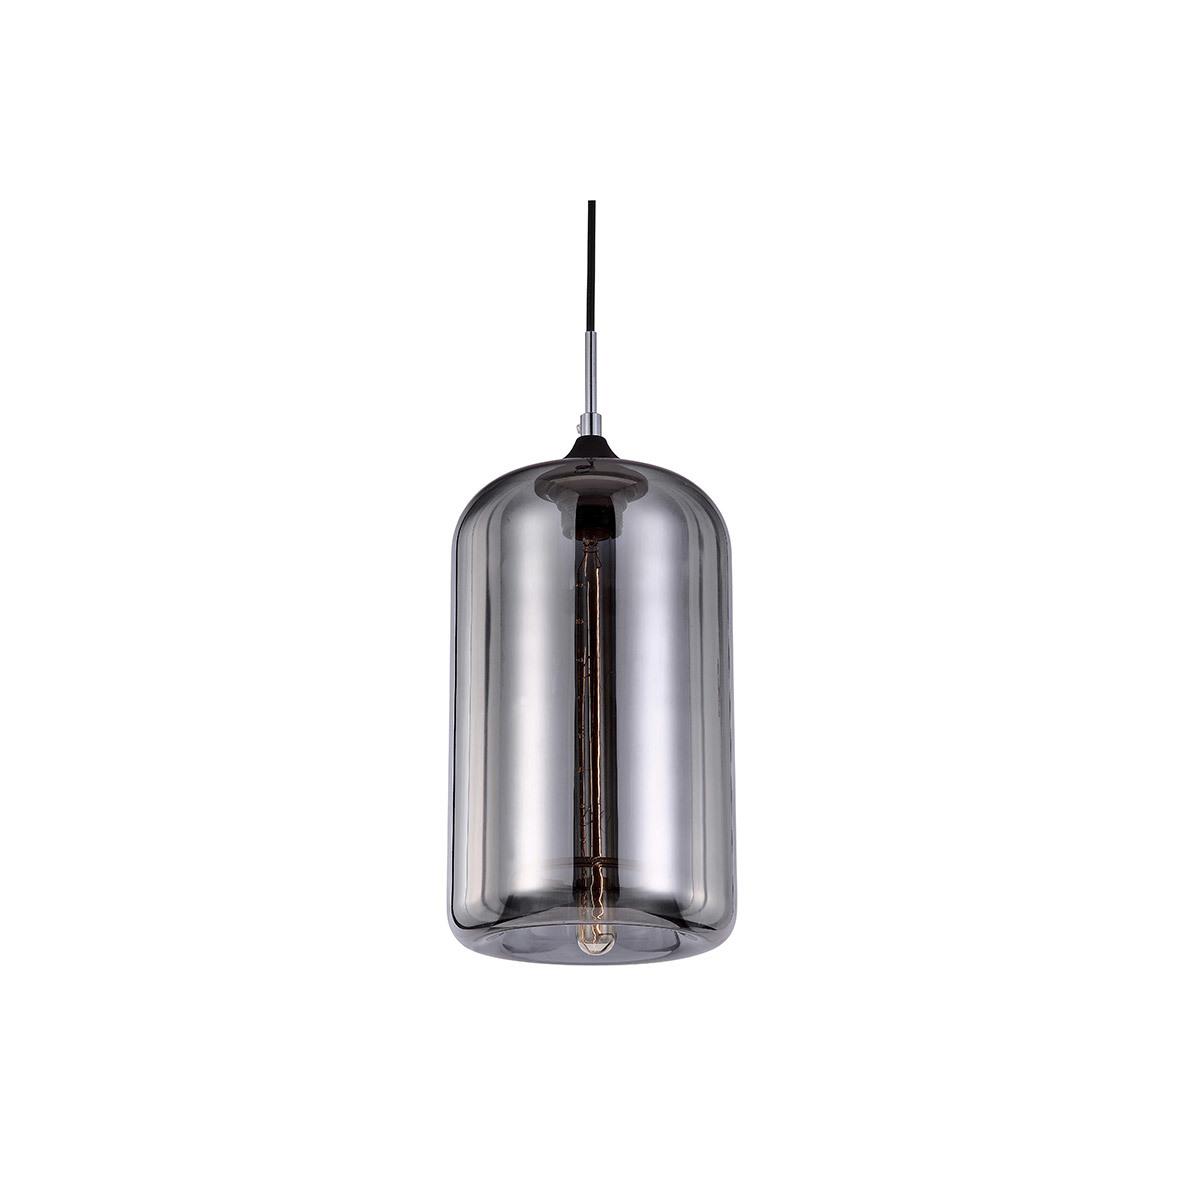 Lampadario design in vetro soffiato trasparente Nero MILAN